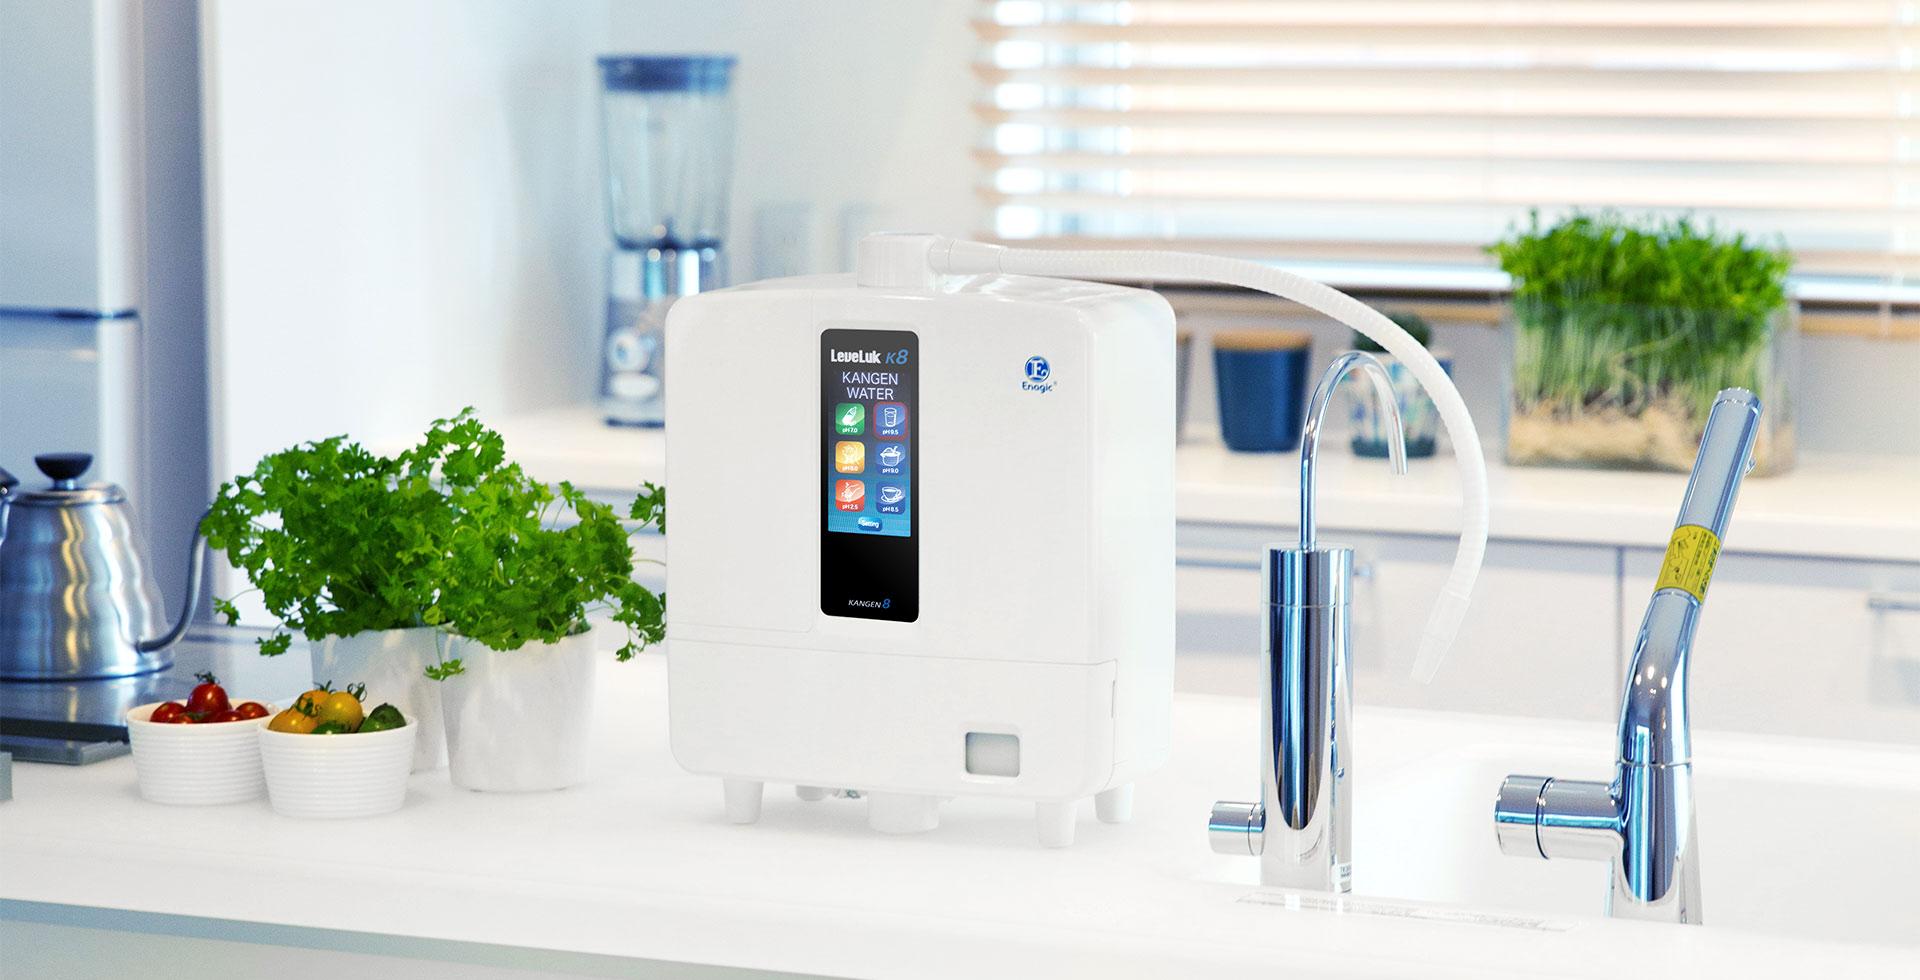 Stay healthy with water anti-oxidizer machine